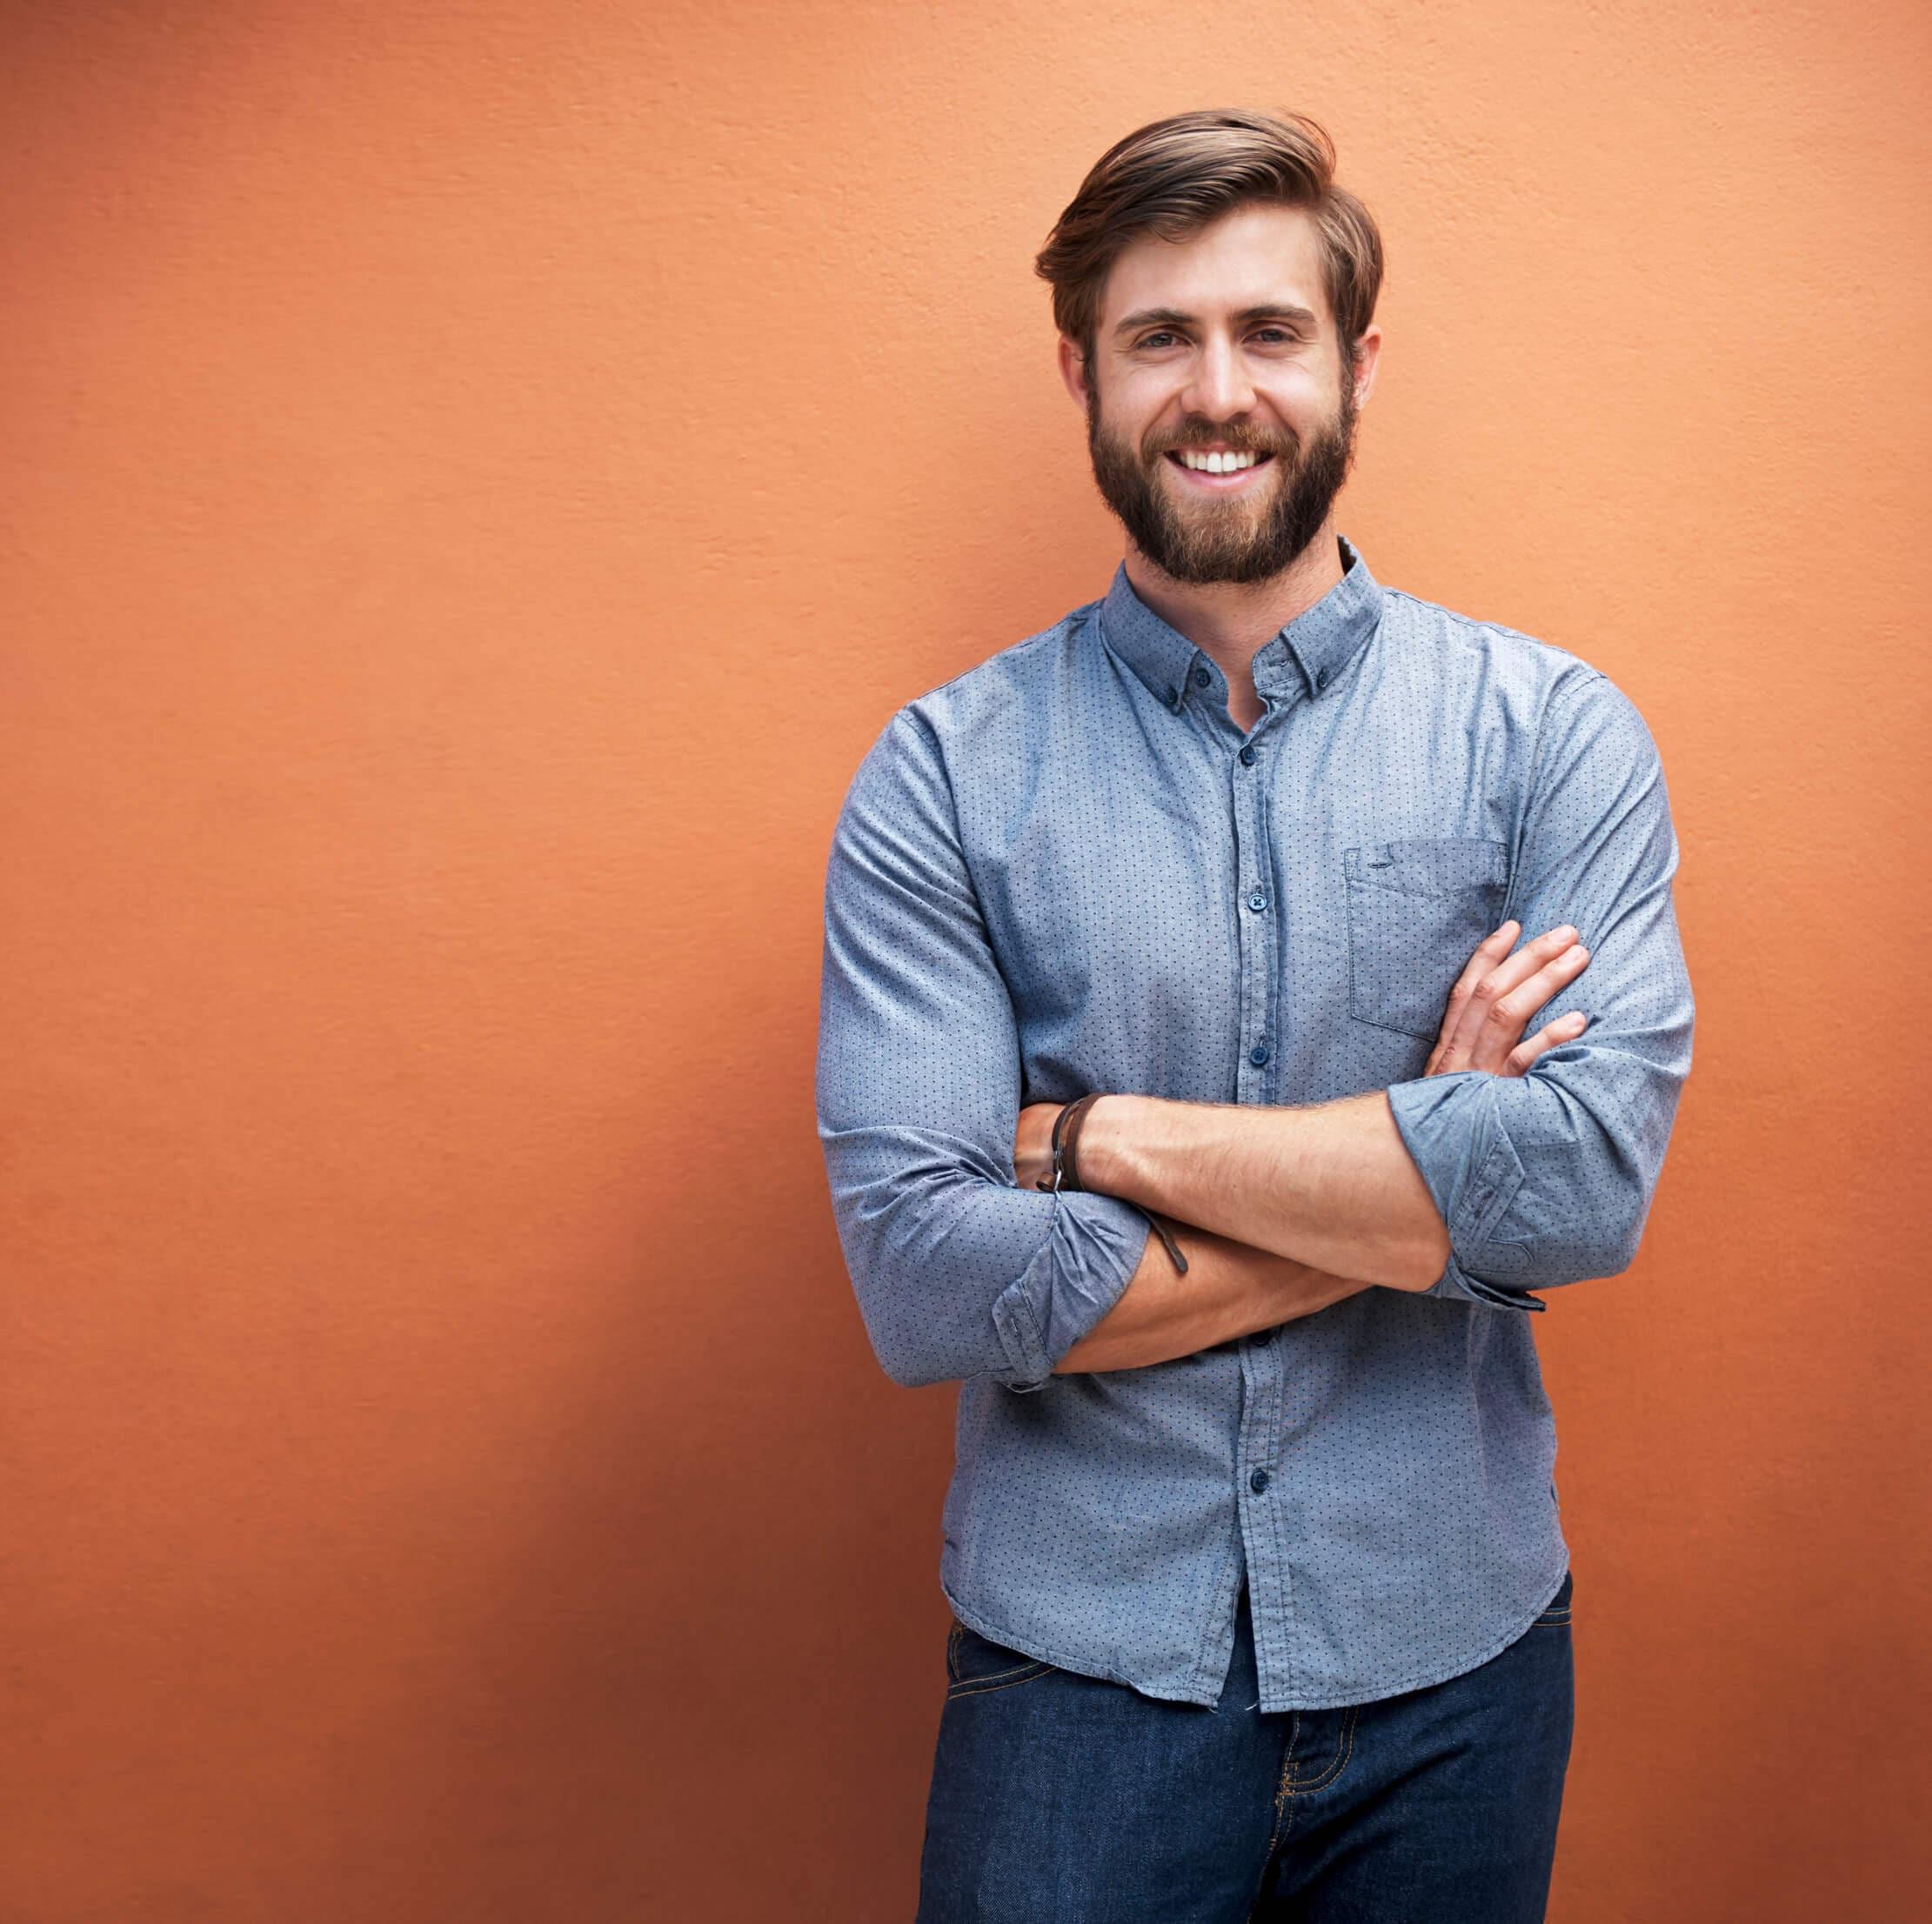 short haircuts for men: short crop short hairstyles men